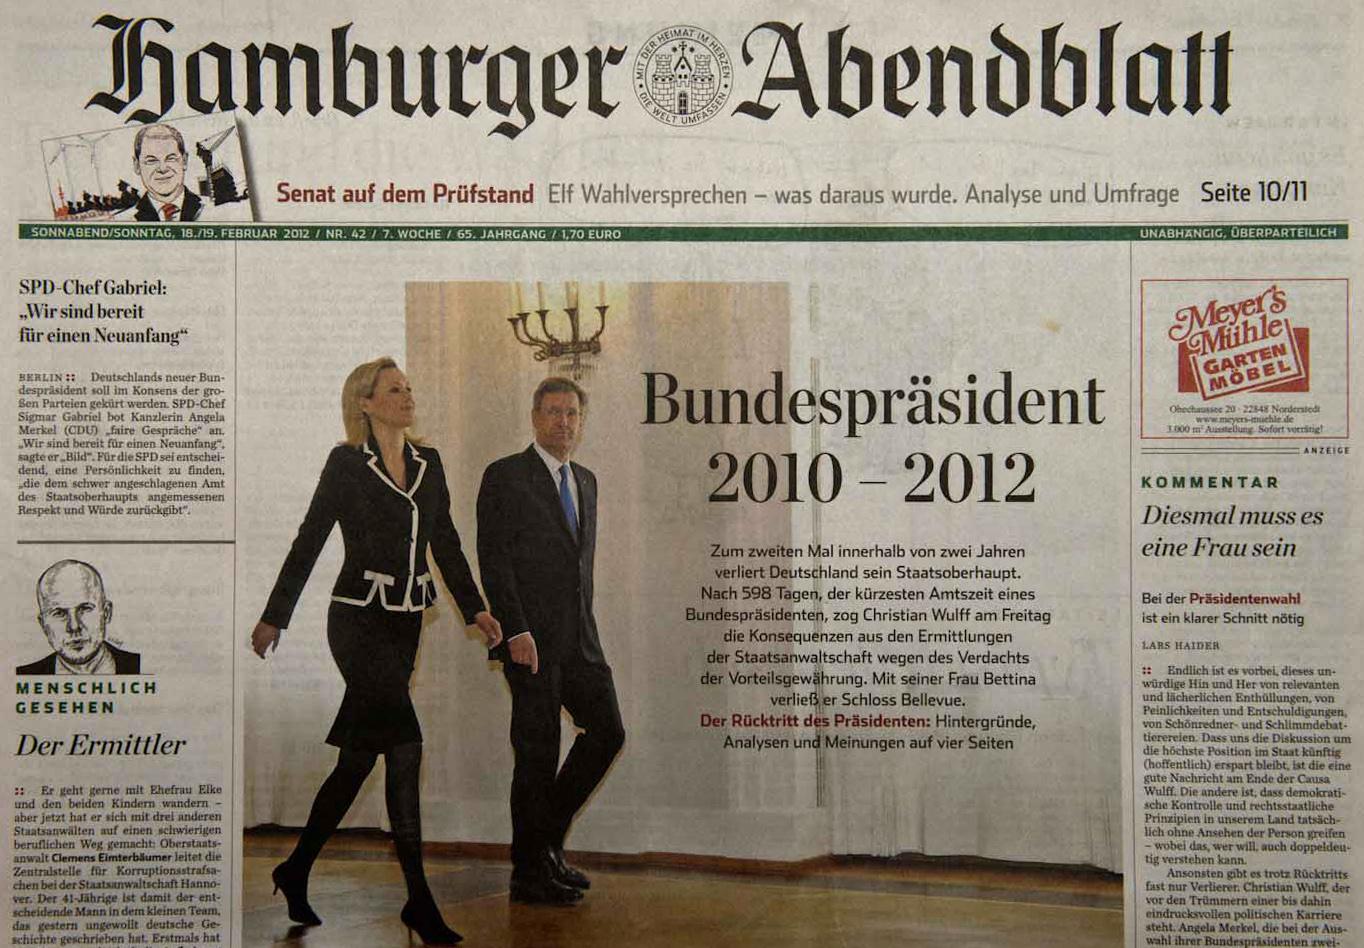 Hamburger Abendblatt, 18.02.12